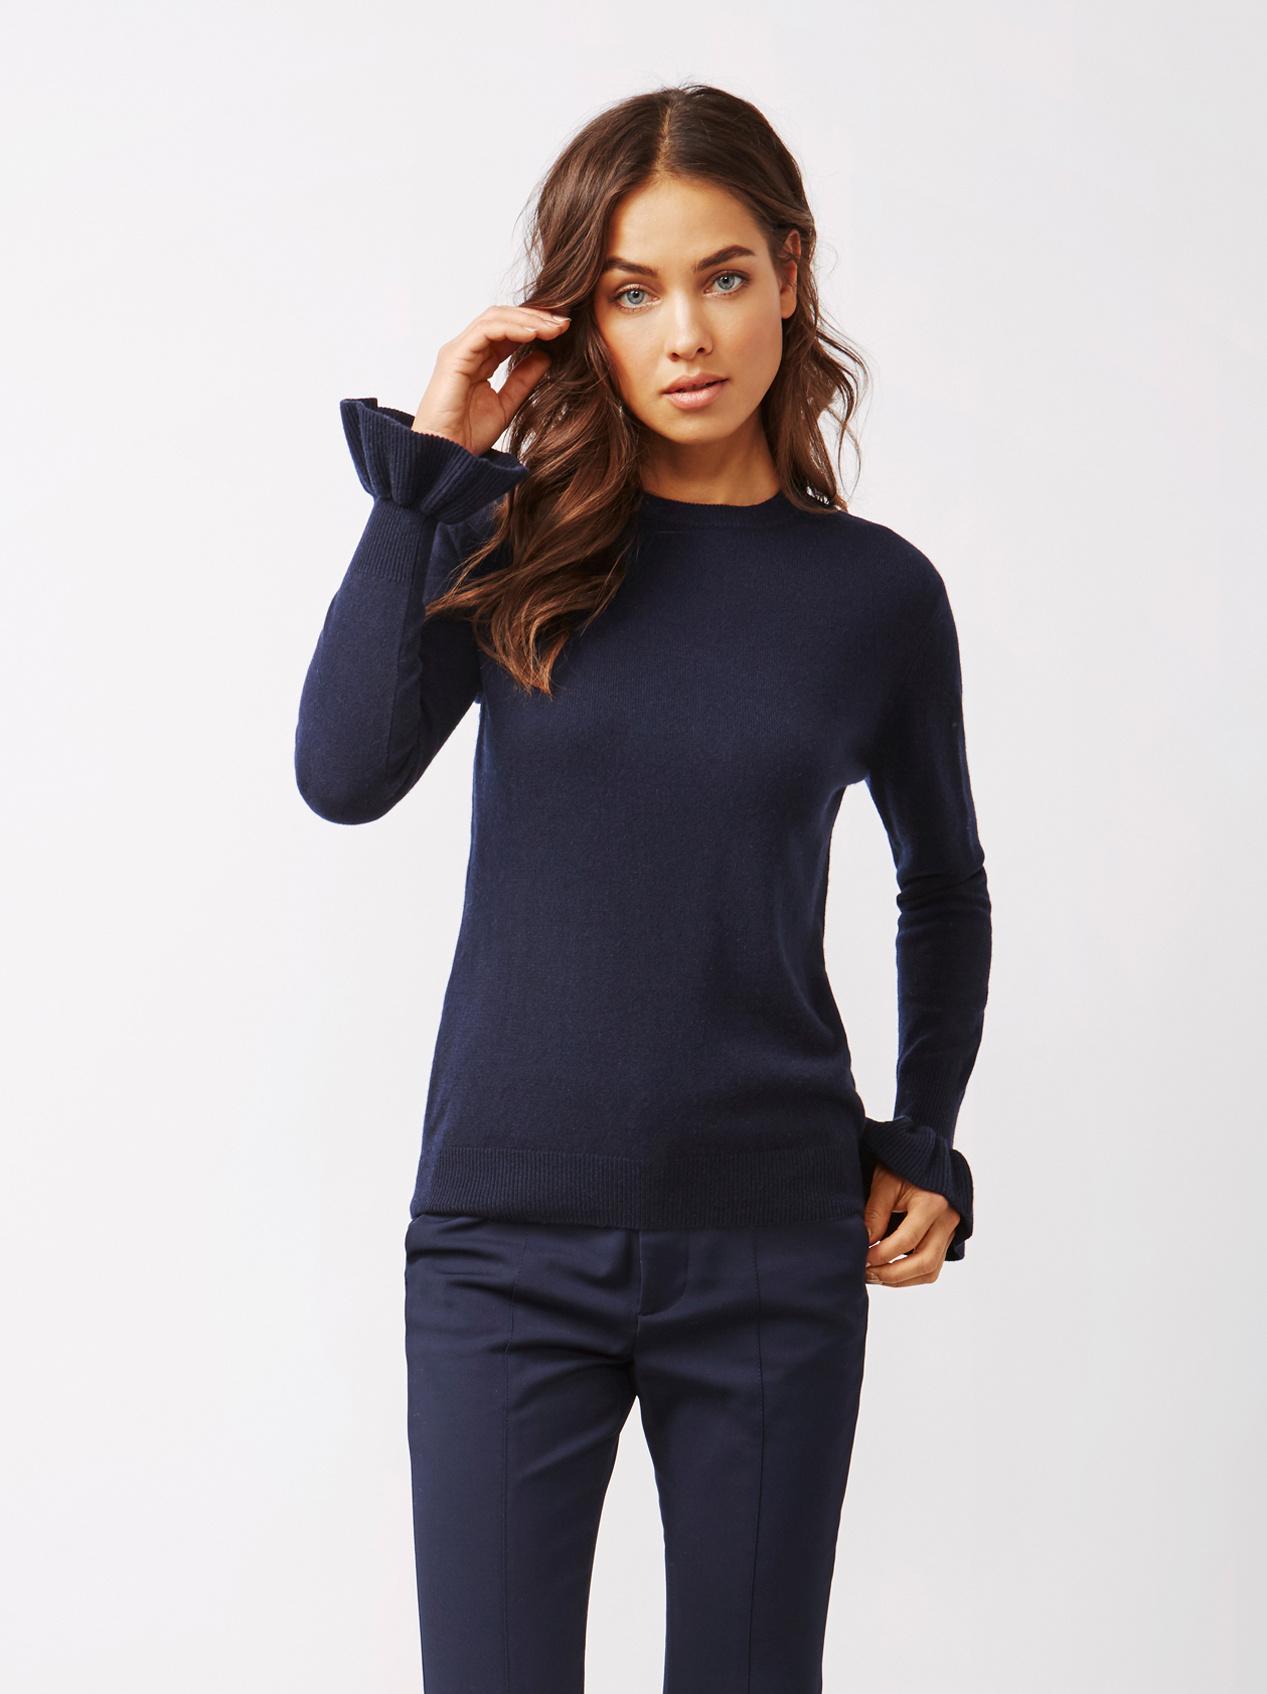 Soft Goat Women's Frill Sweater Navy